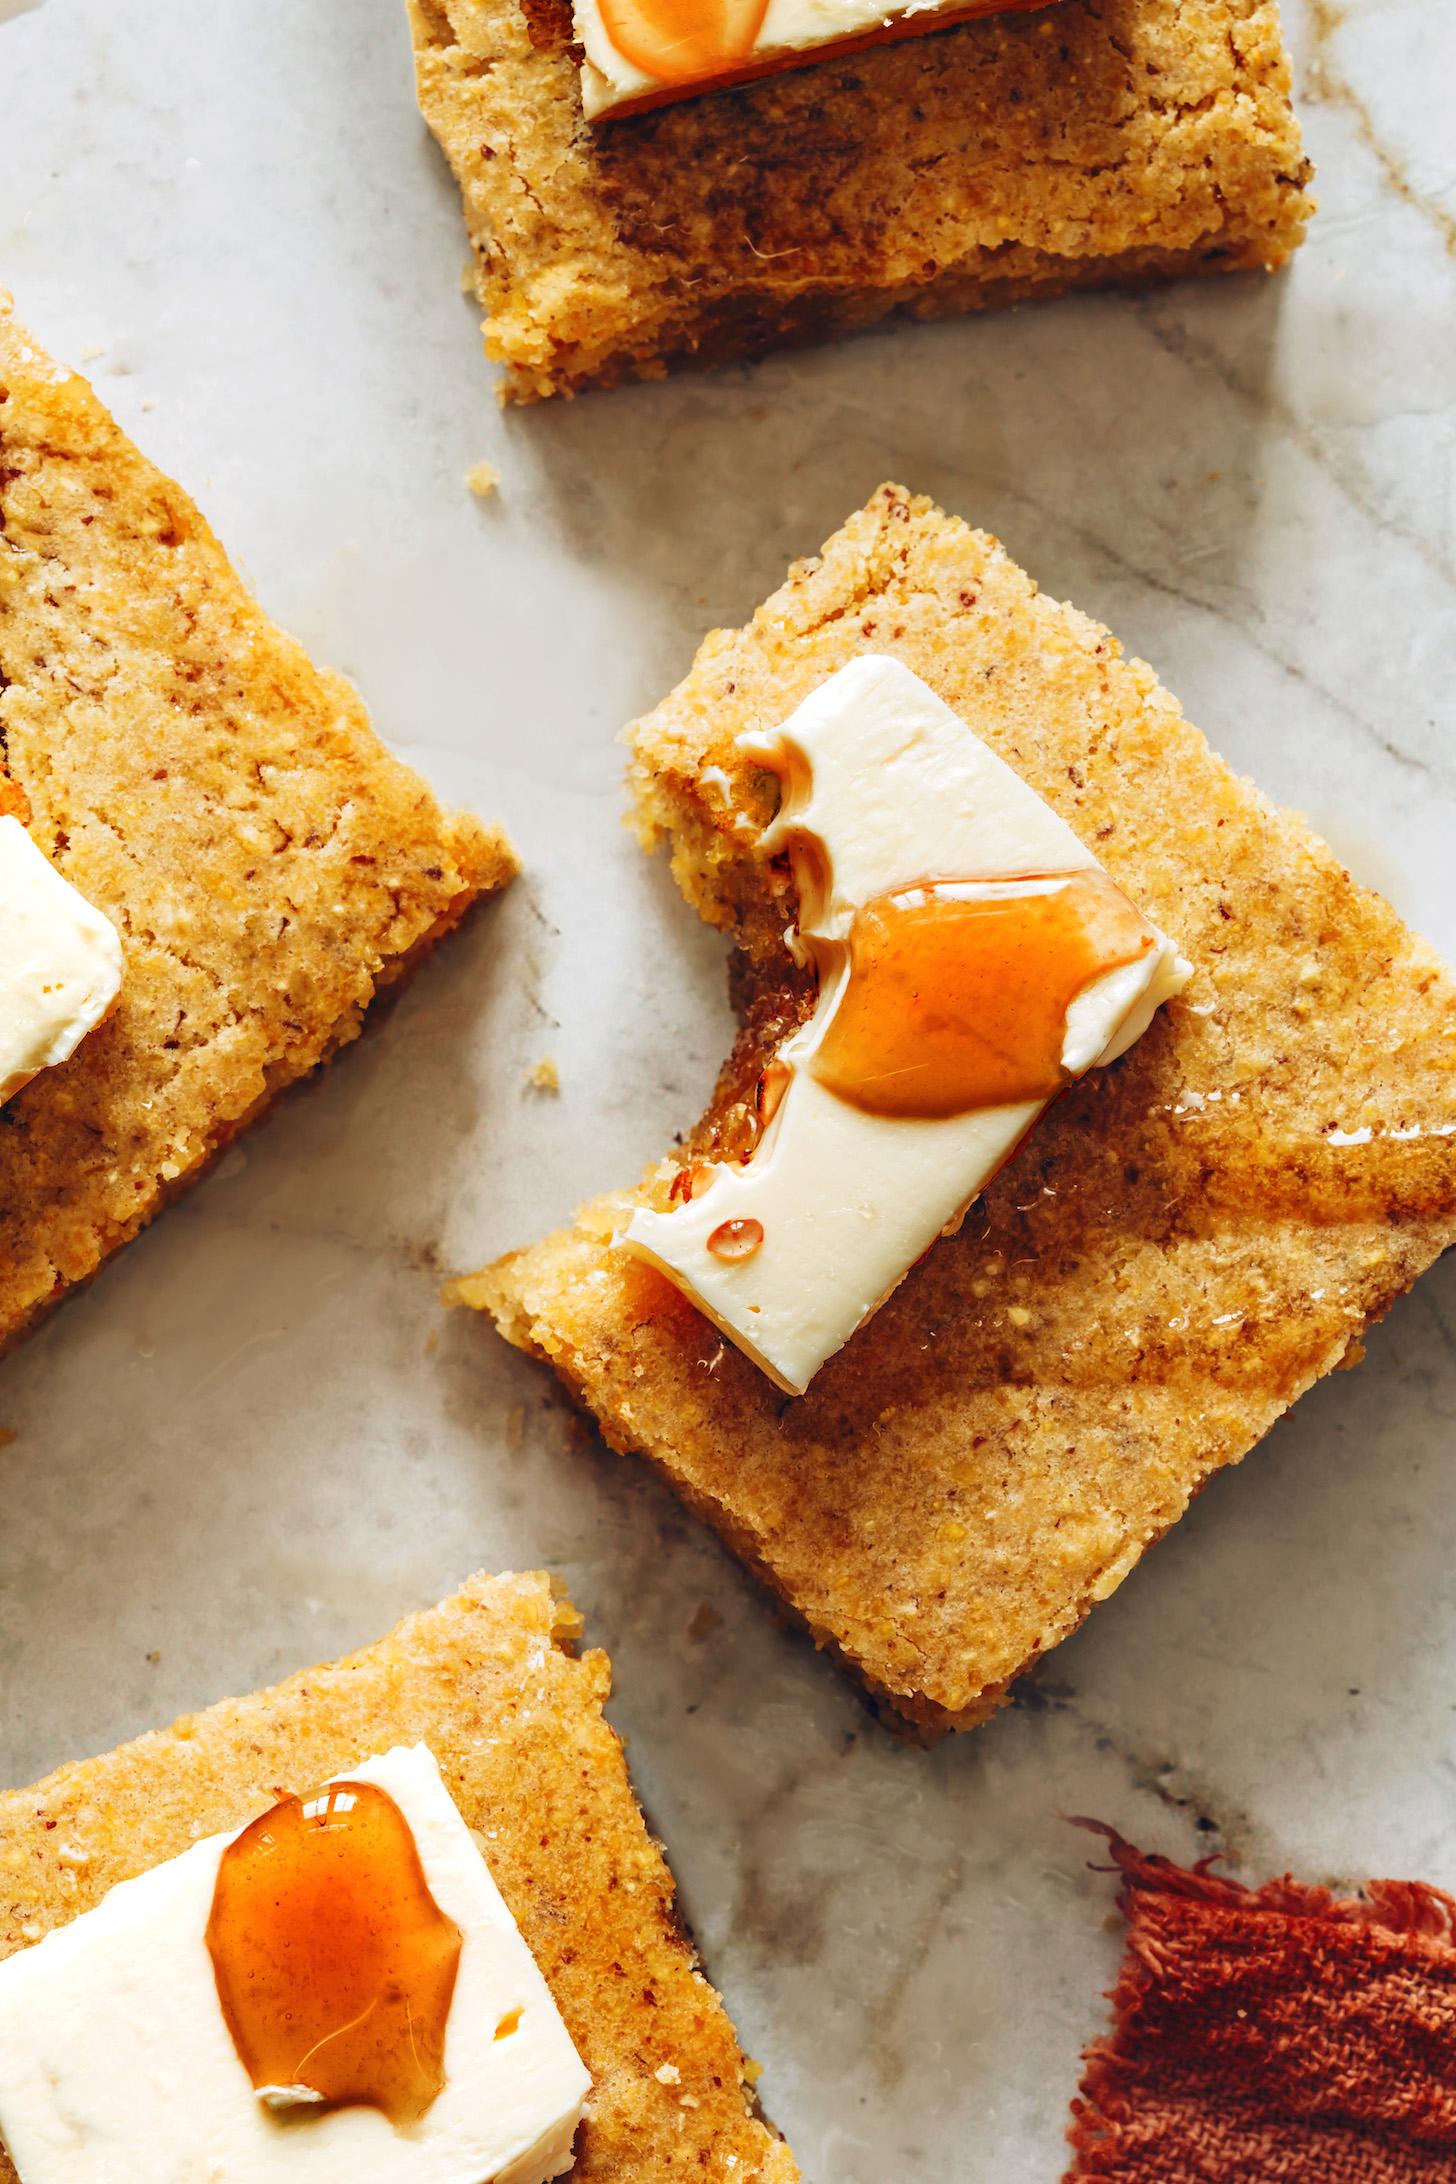 Slices of the best vegan cornbread